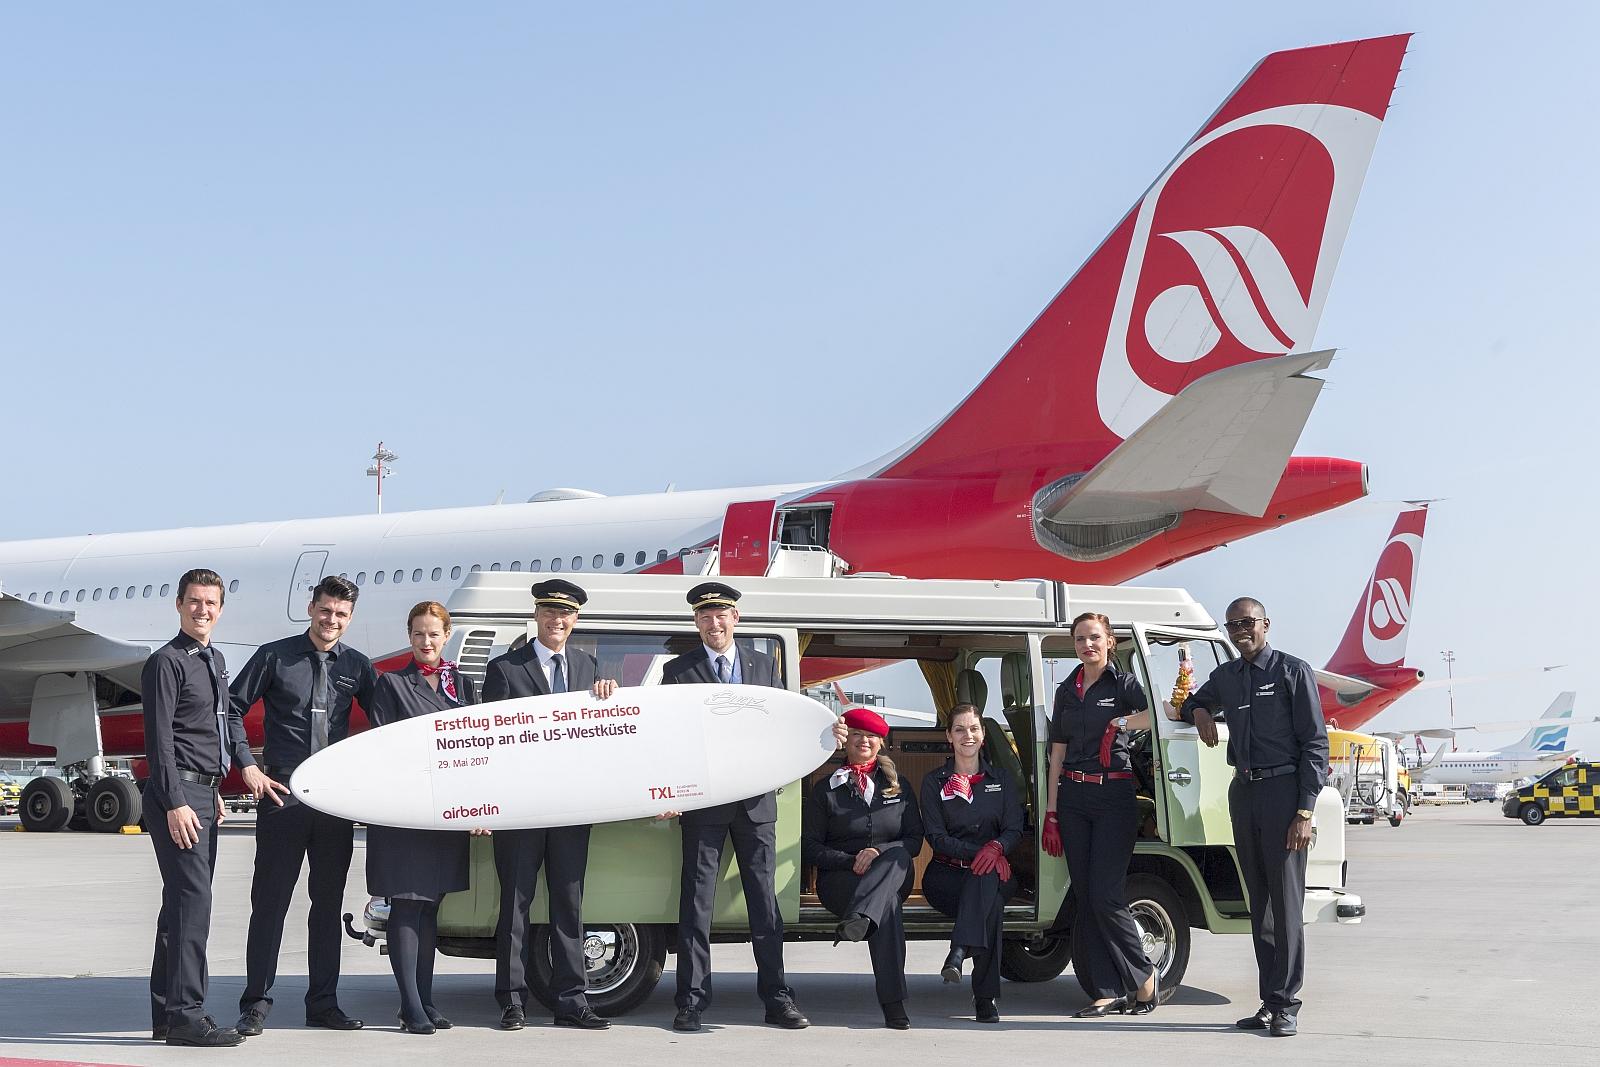 Air Berlin fliegt von Berlin nach San Francisco - usatipps.de